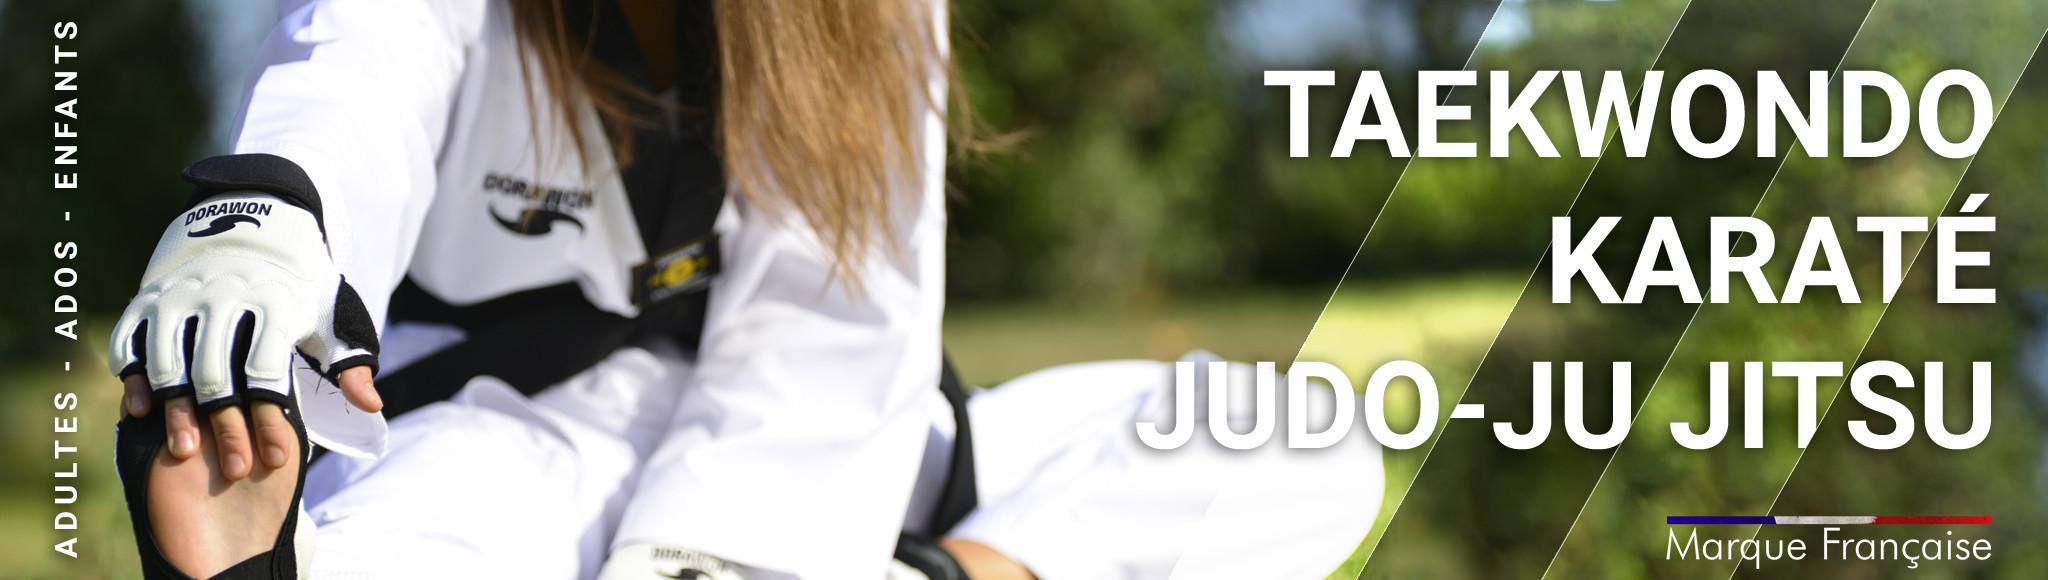 Taekwondo - karaté - Judo